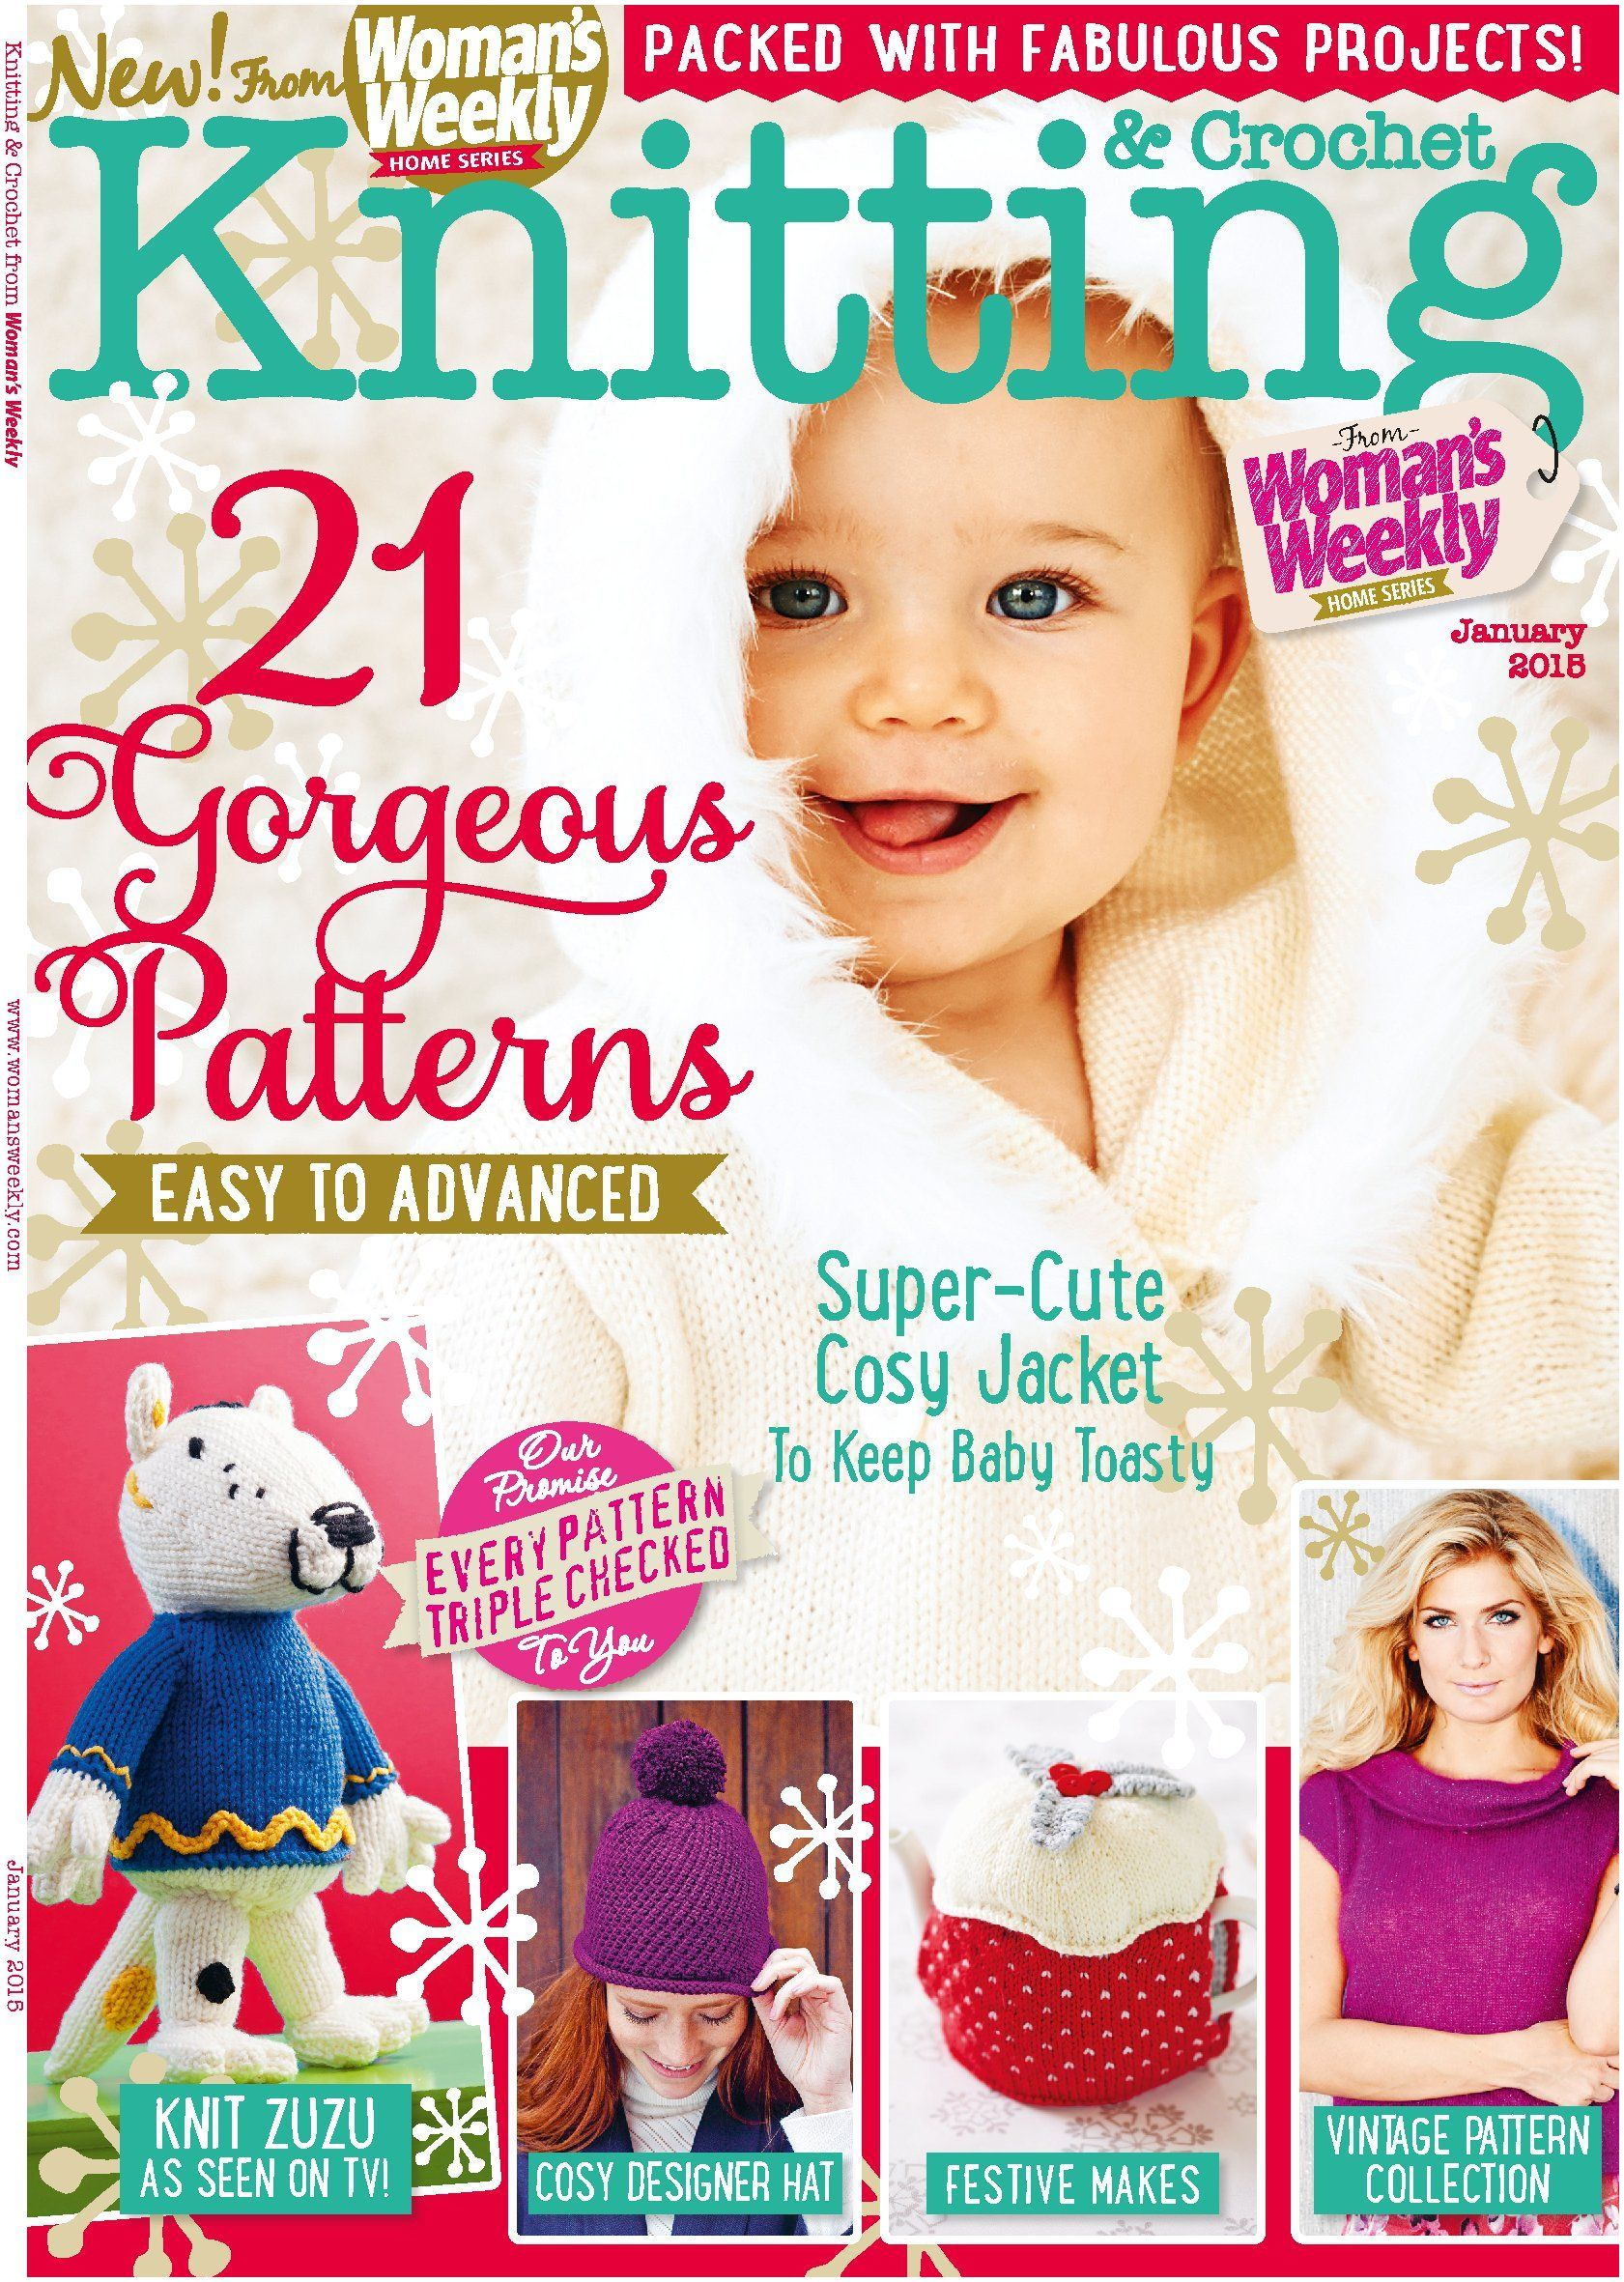 Crochet Book Cover Crochet Books Knit Crochet Crochet Stitches Simply Knitting